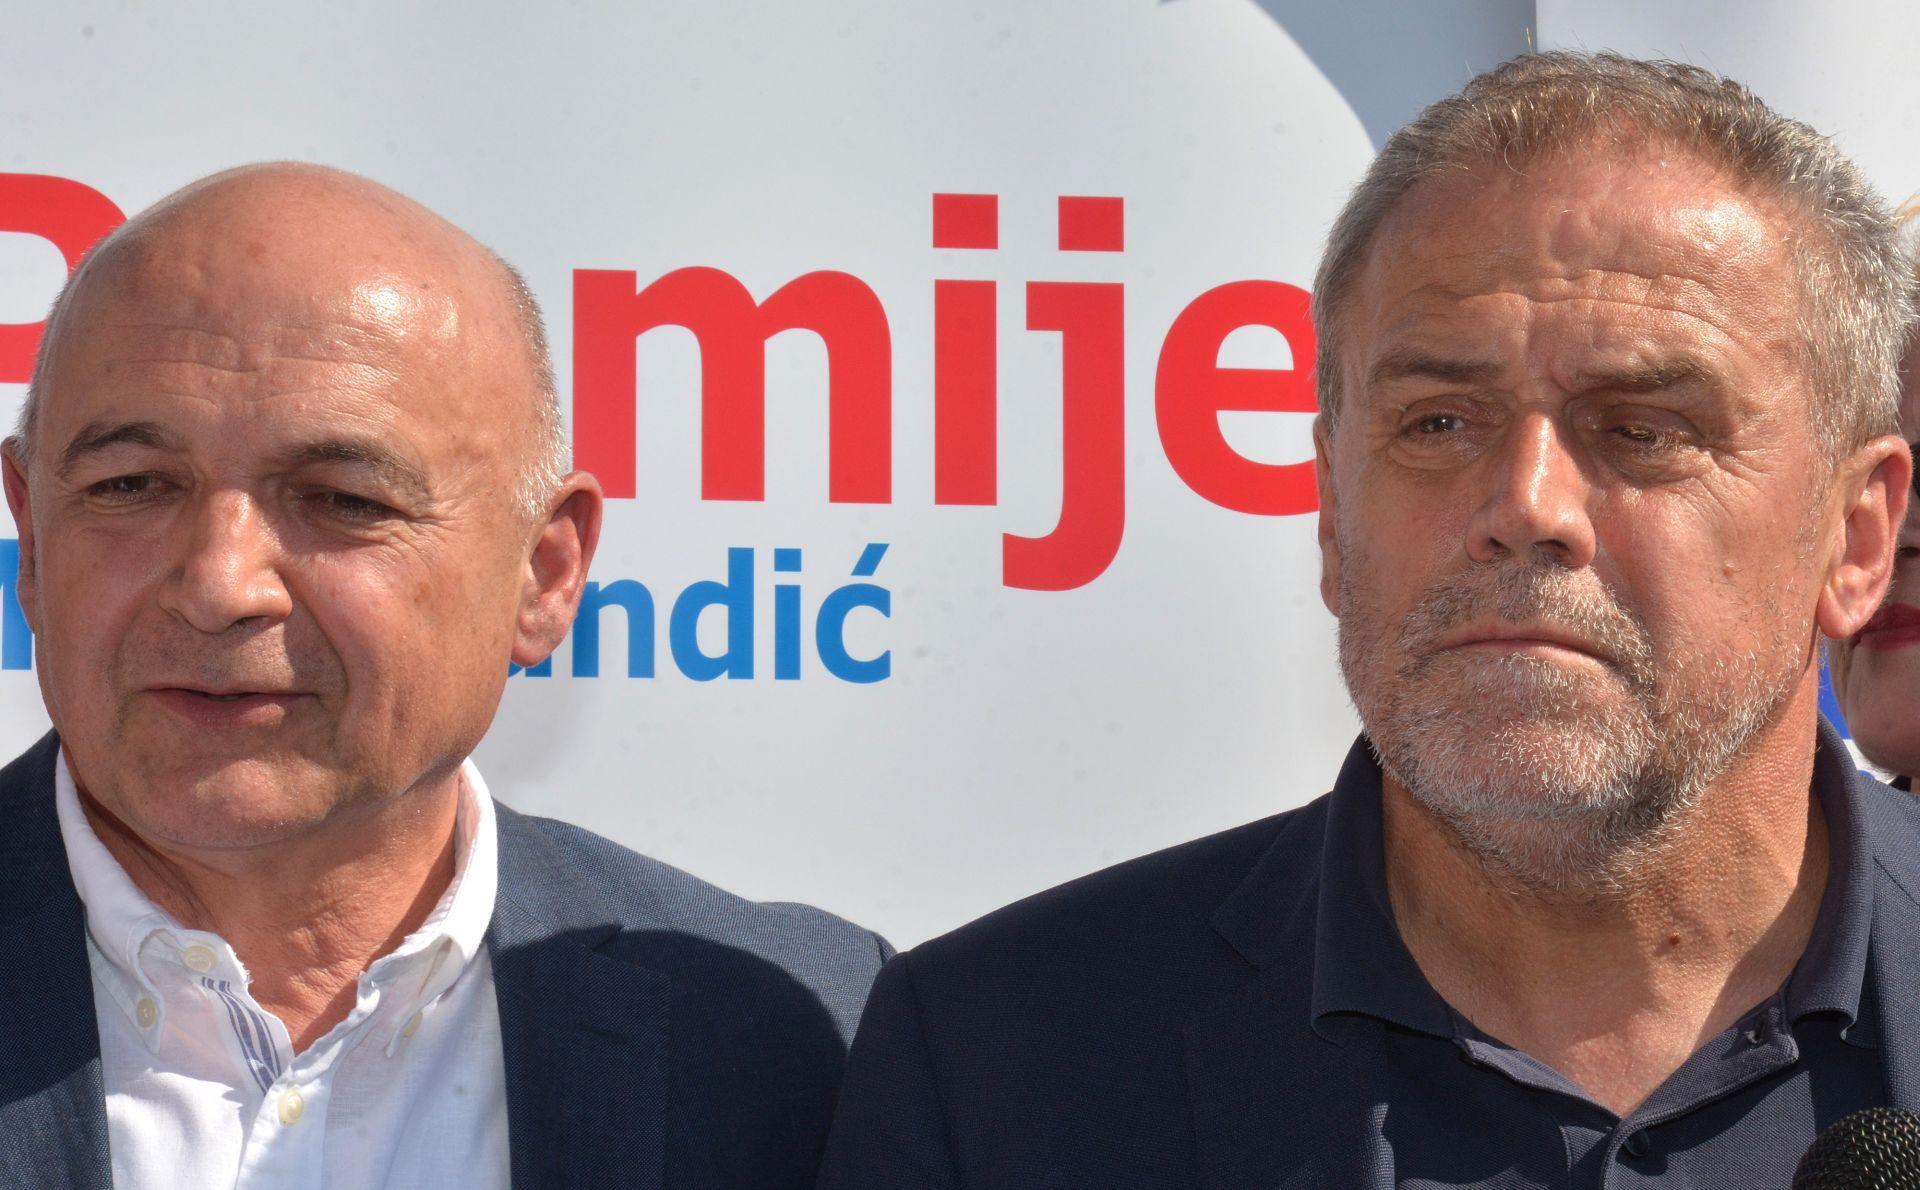 Bandić tvrdi će u Saboru imat Klub s pet zastupnika